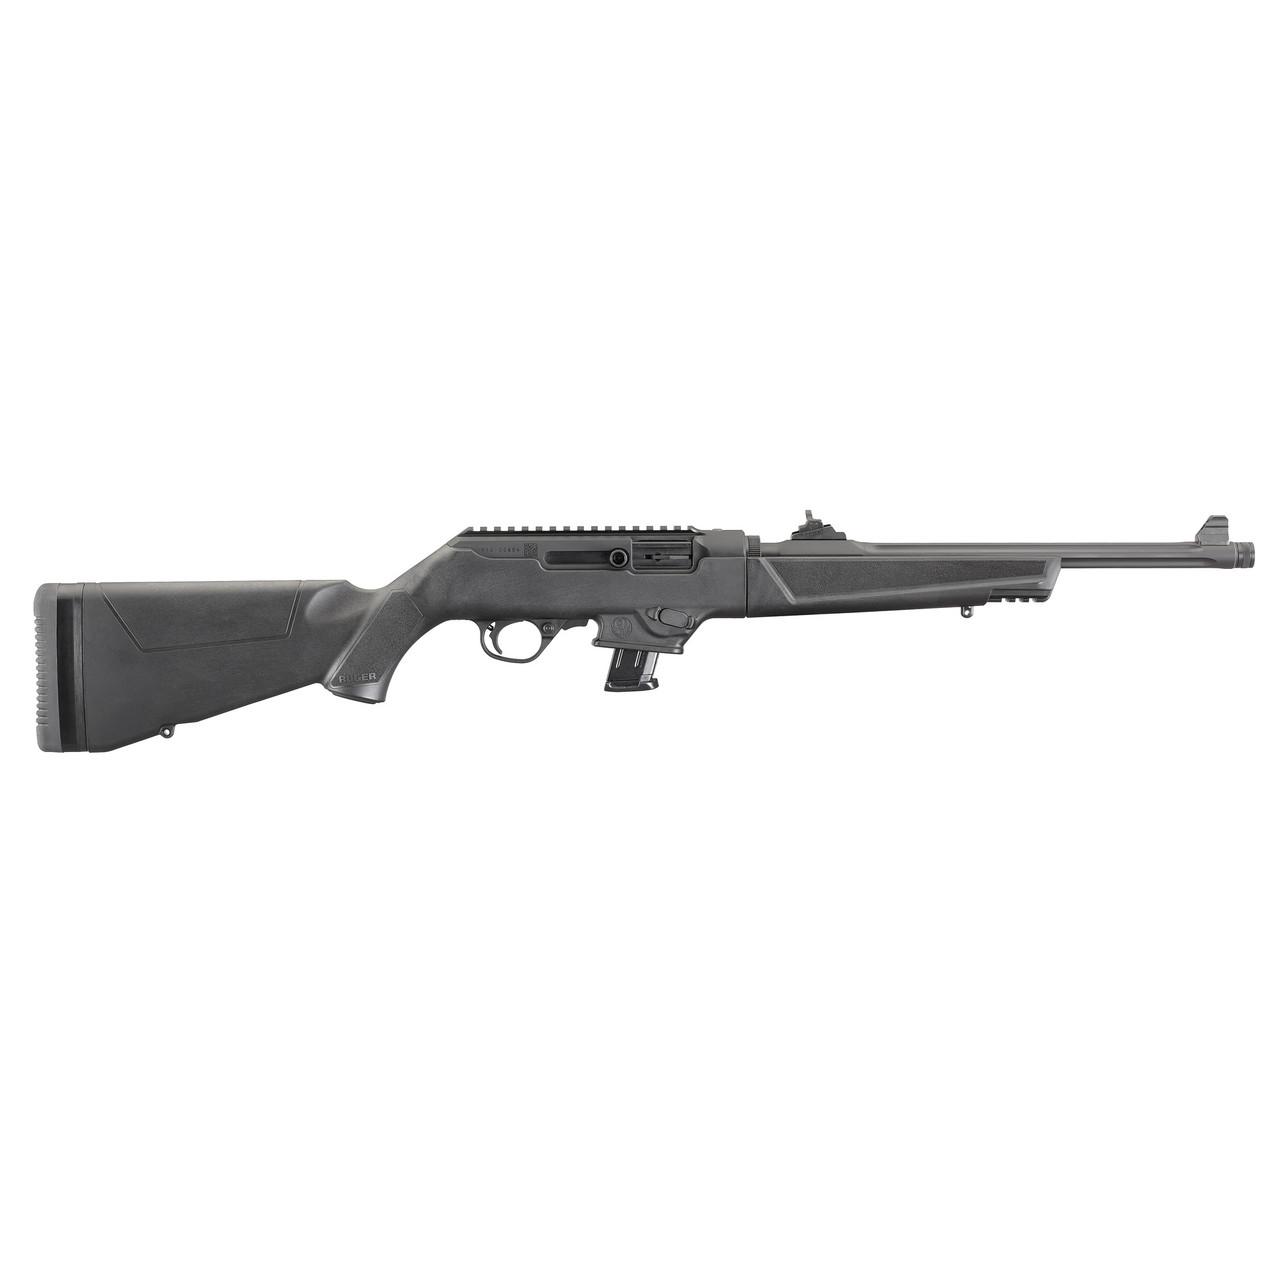 Ruger PC Carbine (Heavy Barrel) CALIFORNIA LEGAL - 9mm